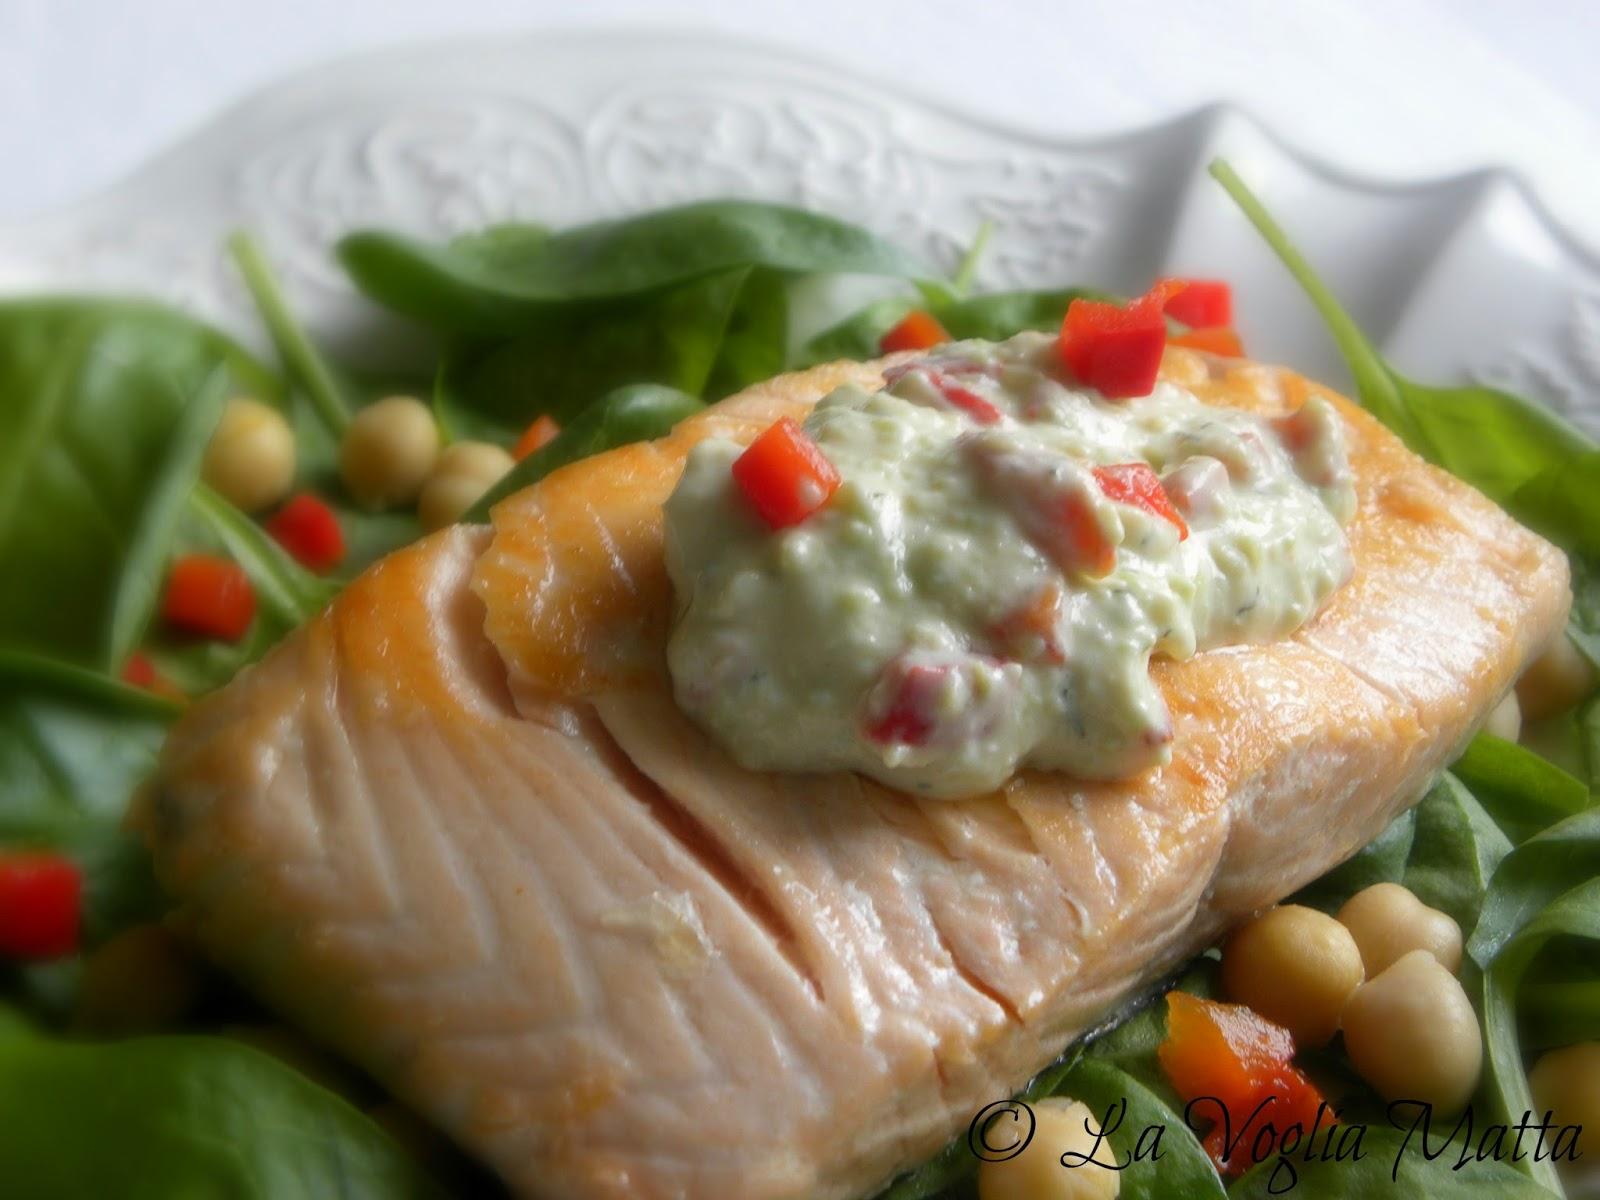 salmone con salsa all'avocado e peperoni